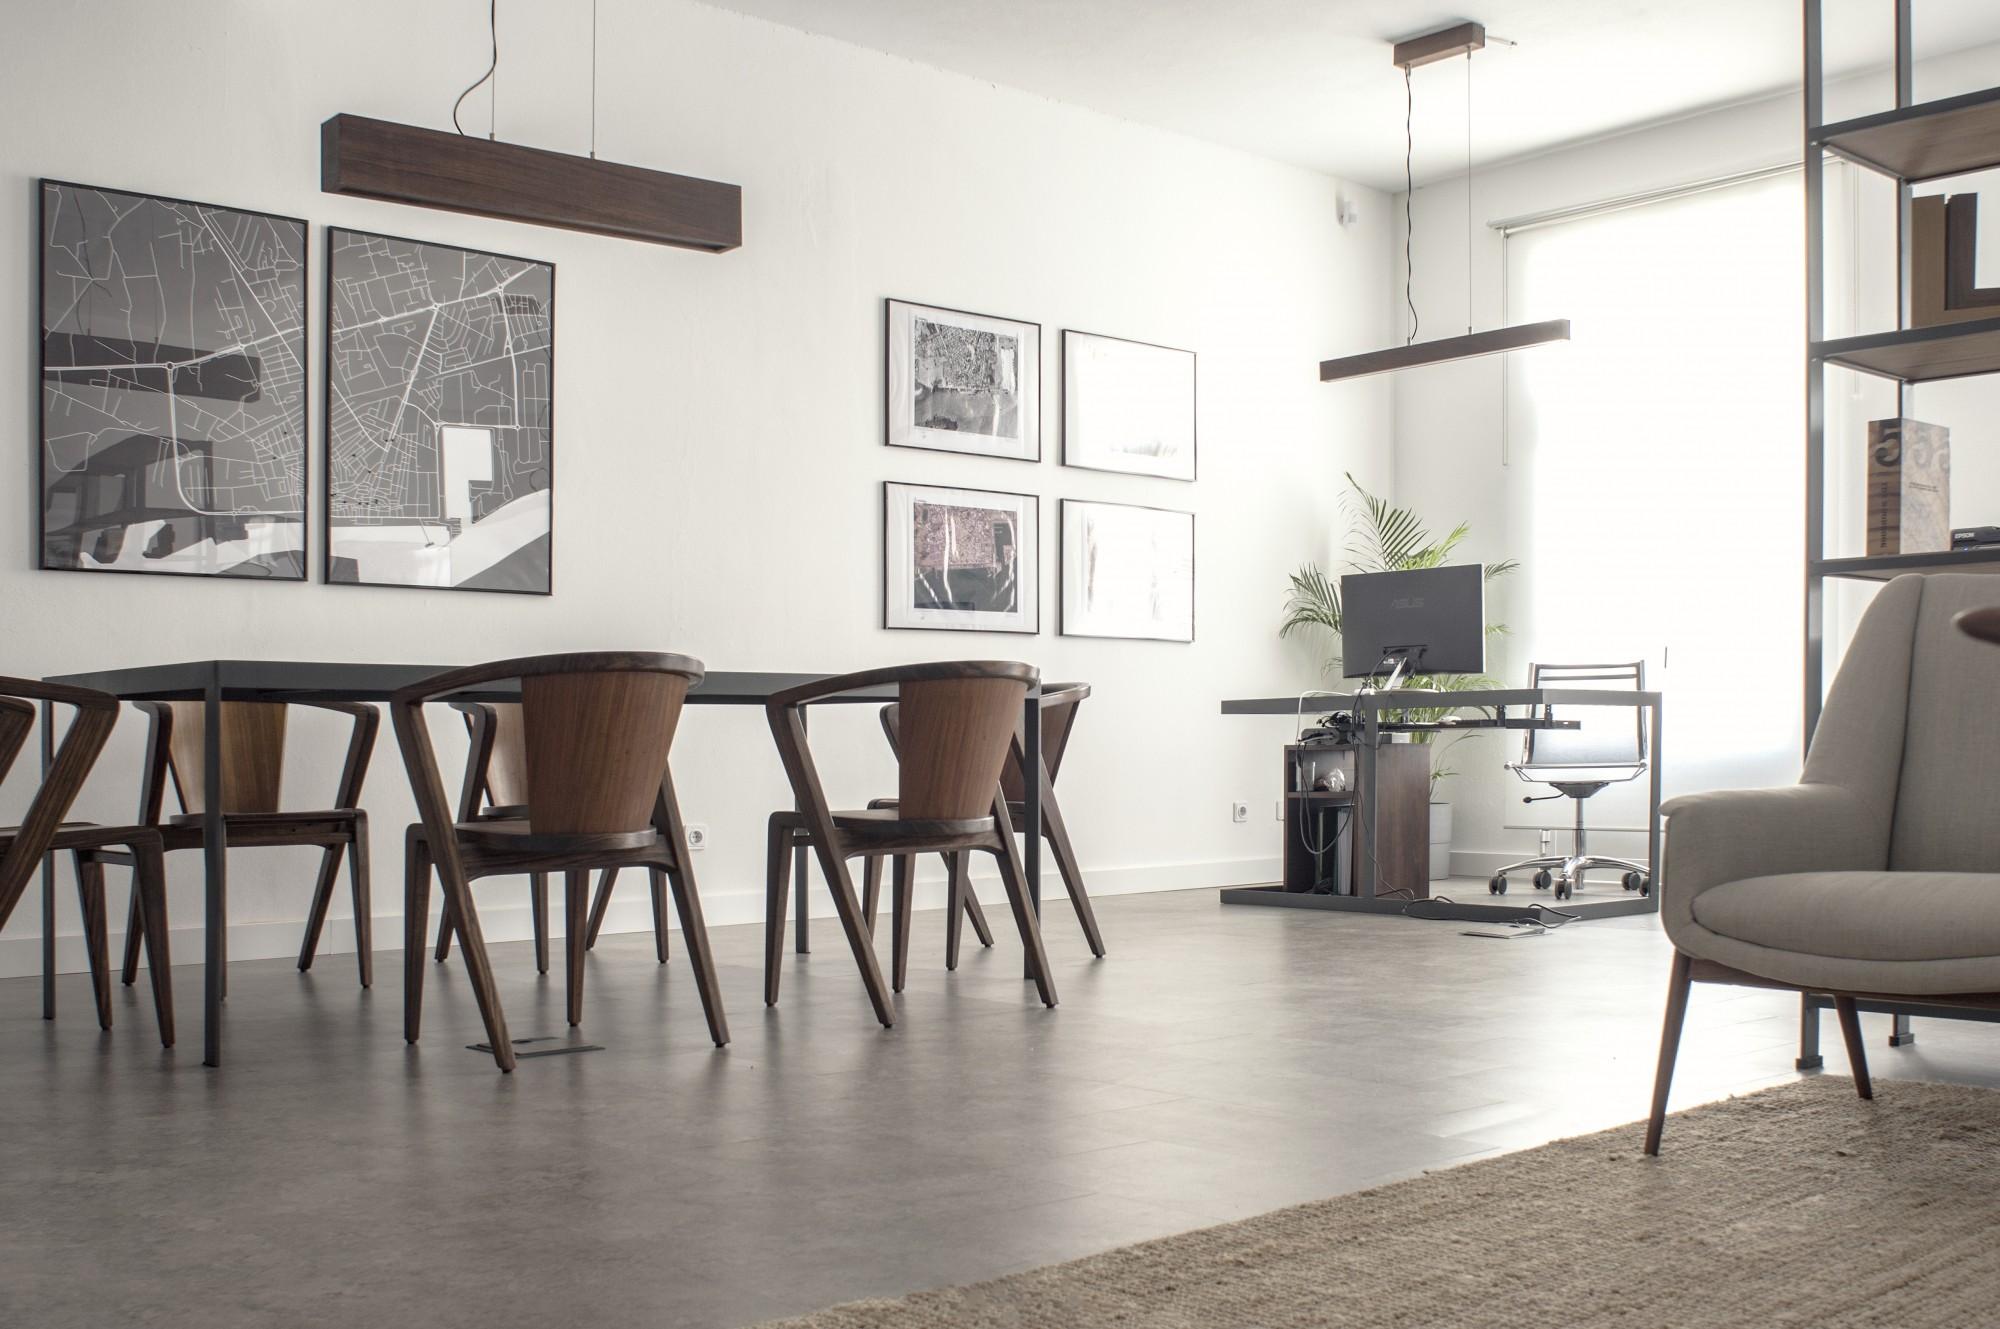 Custom furniture and lighting. Designed by Sena Architects